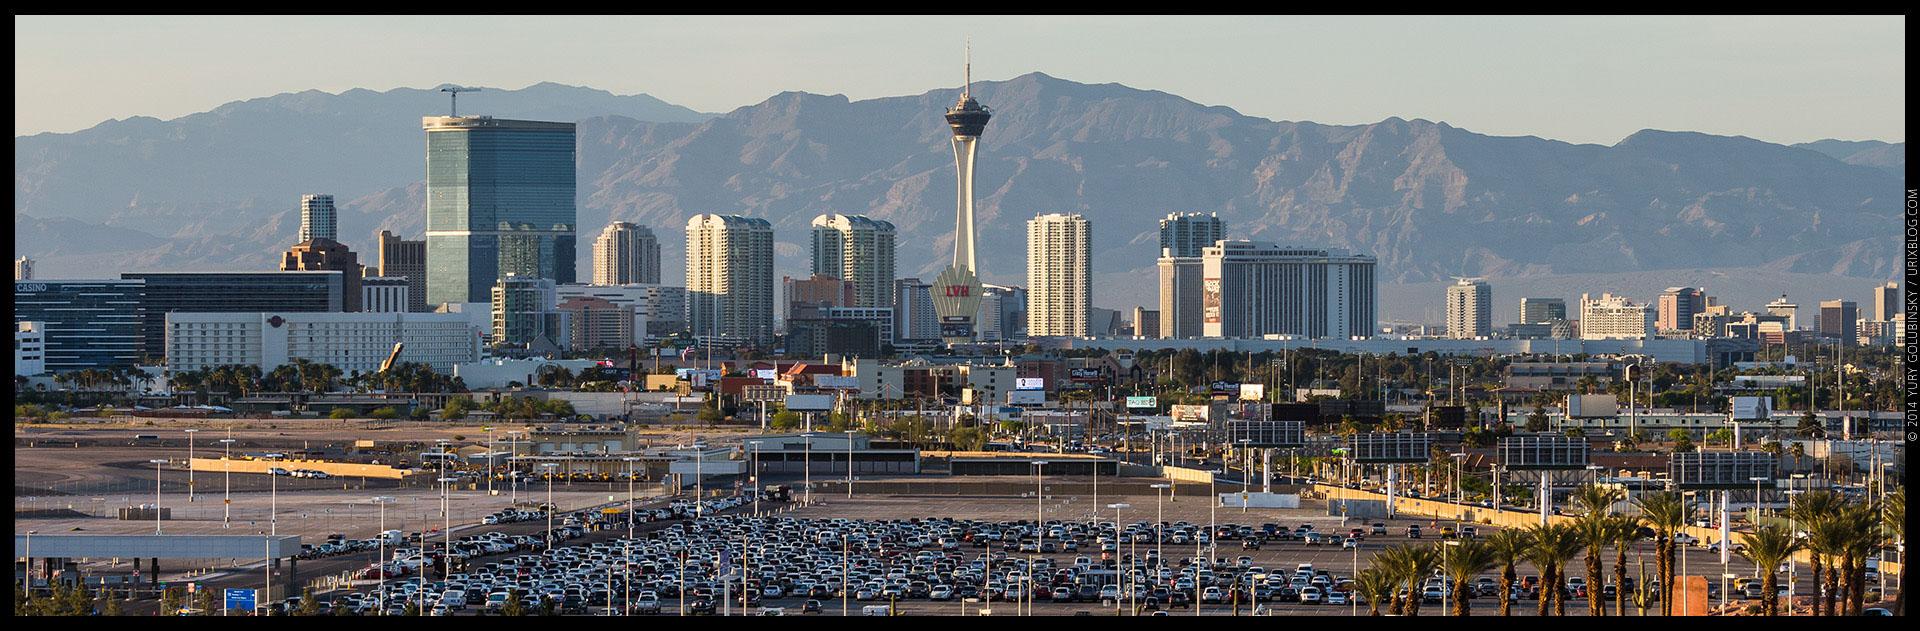 Stratosphere tower, casino, hotel, parking, mountains, 2014, LAS, Las Vegas McCarran International airport, strip, LV, Clark County, USA, Nevada, panorama, horizon, city